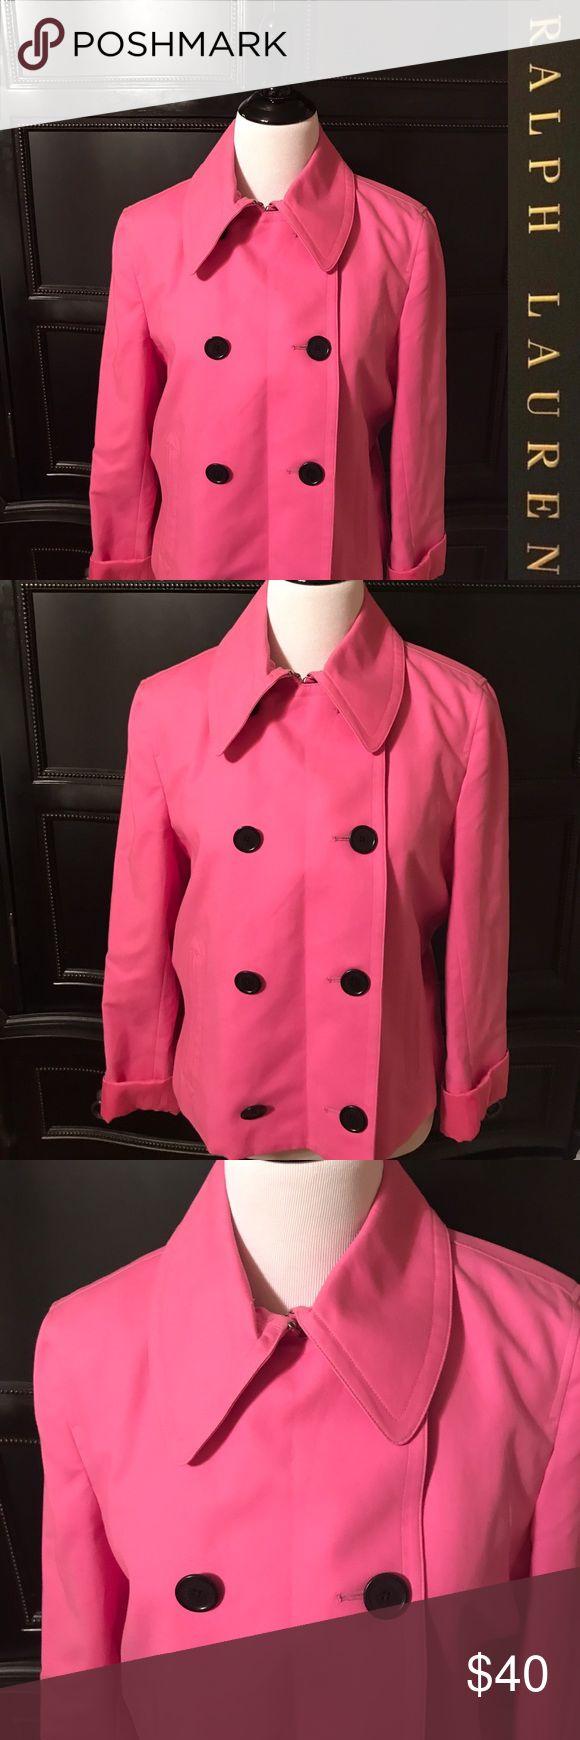 Ralph Lauren hot pink pea style jacket XL Ralph Lauren hot pink pea style jacket XL super cute and in great condition with silk lining. Ralph Lauren Jackets & Coats Blazers